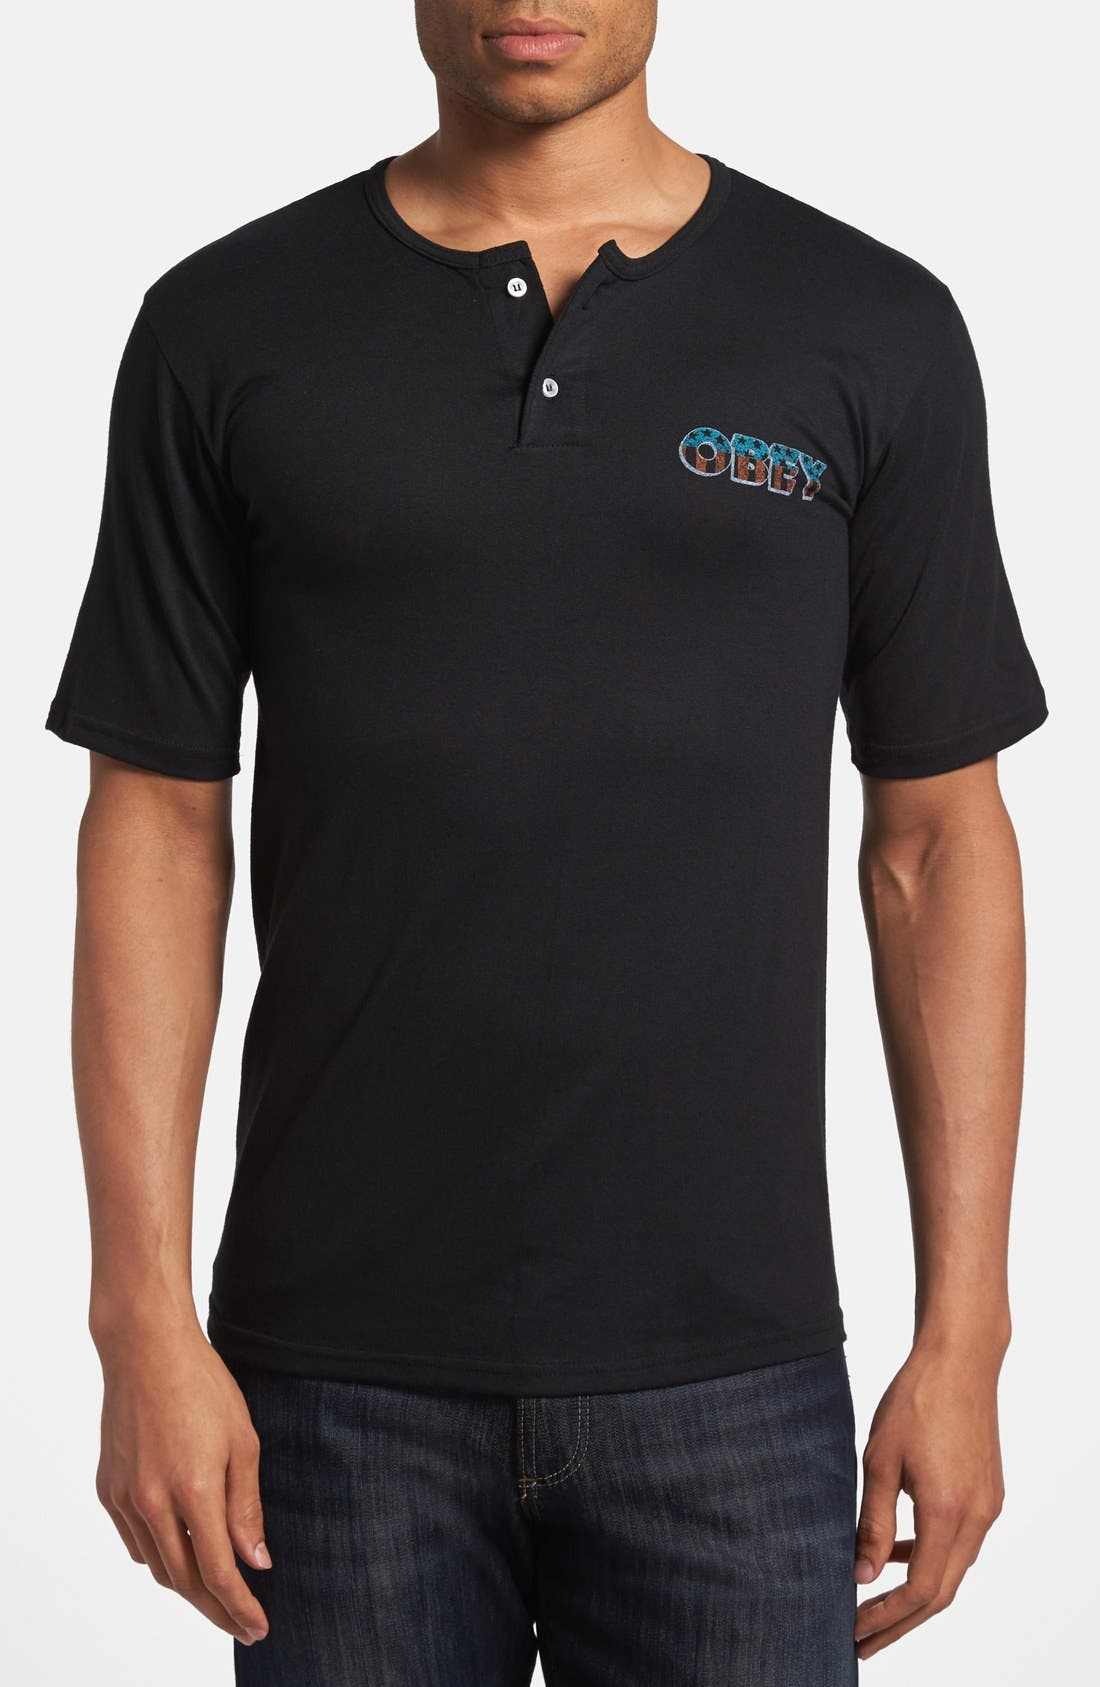 Main Image - Obey 'Spirit of the Street' Short Sleeve Henley T-Shirt